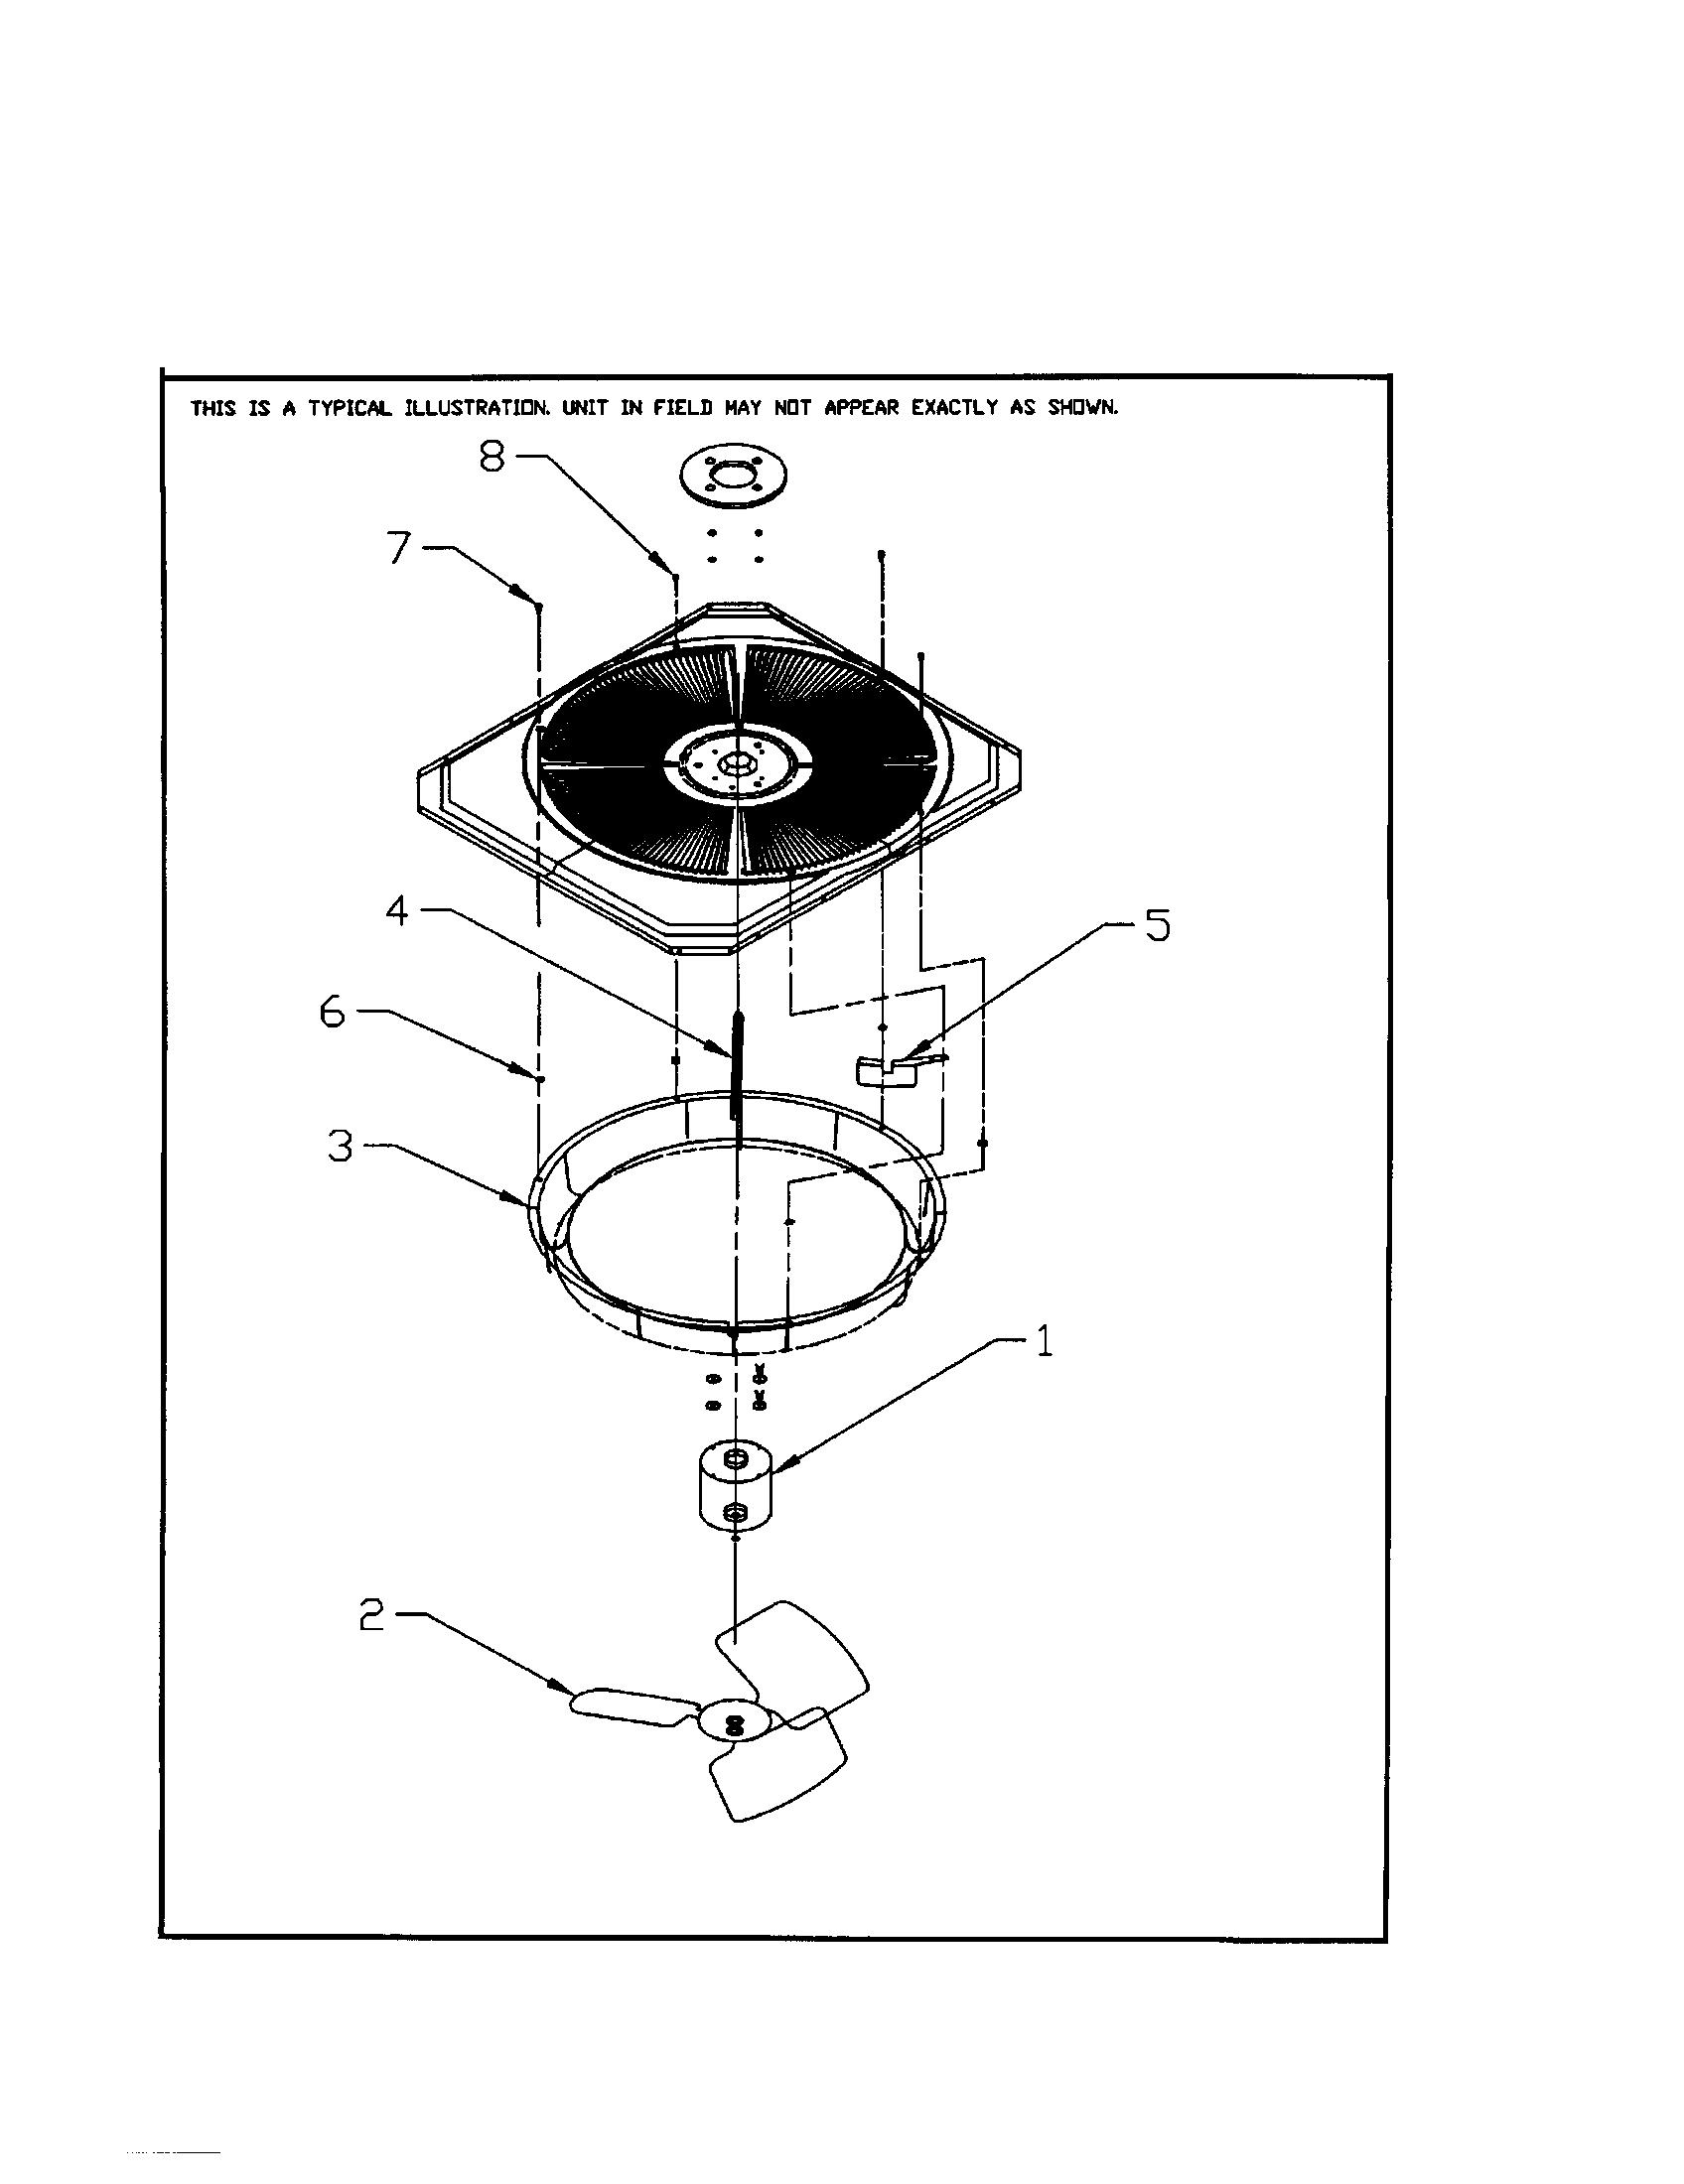 trane condensing unit wiring schematic oe 4893  trane parts diagram schematic wiring  trane parts diagram schematic wiring